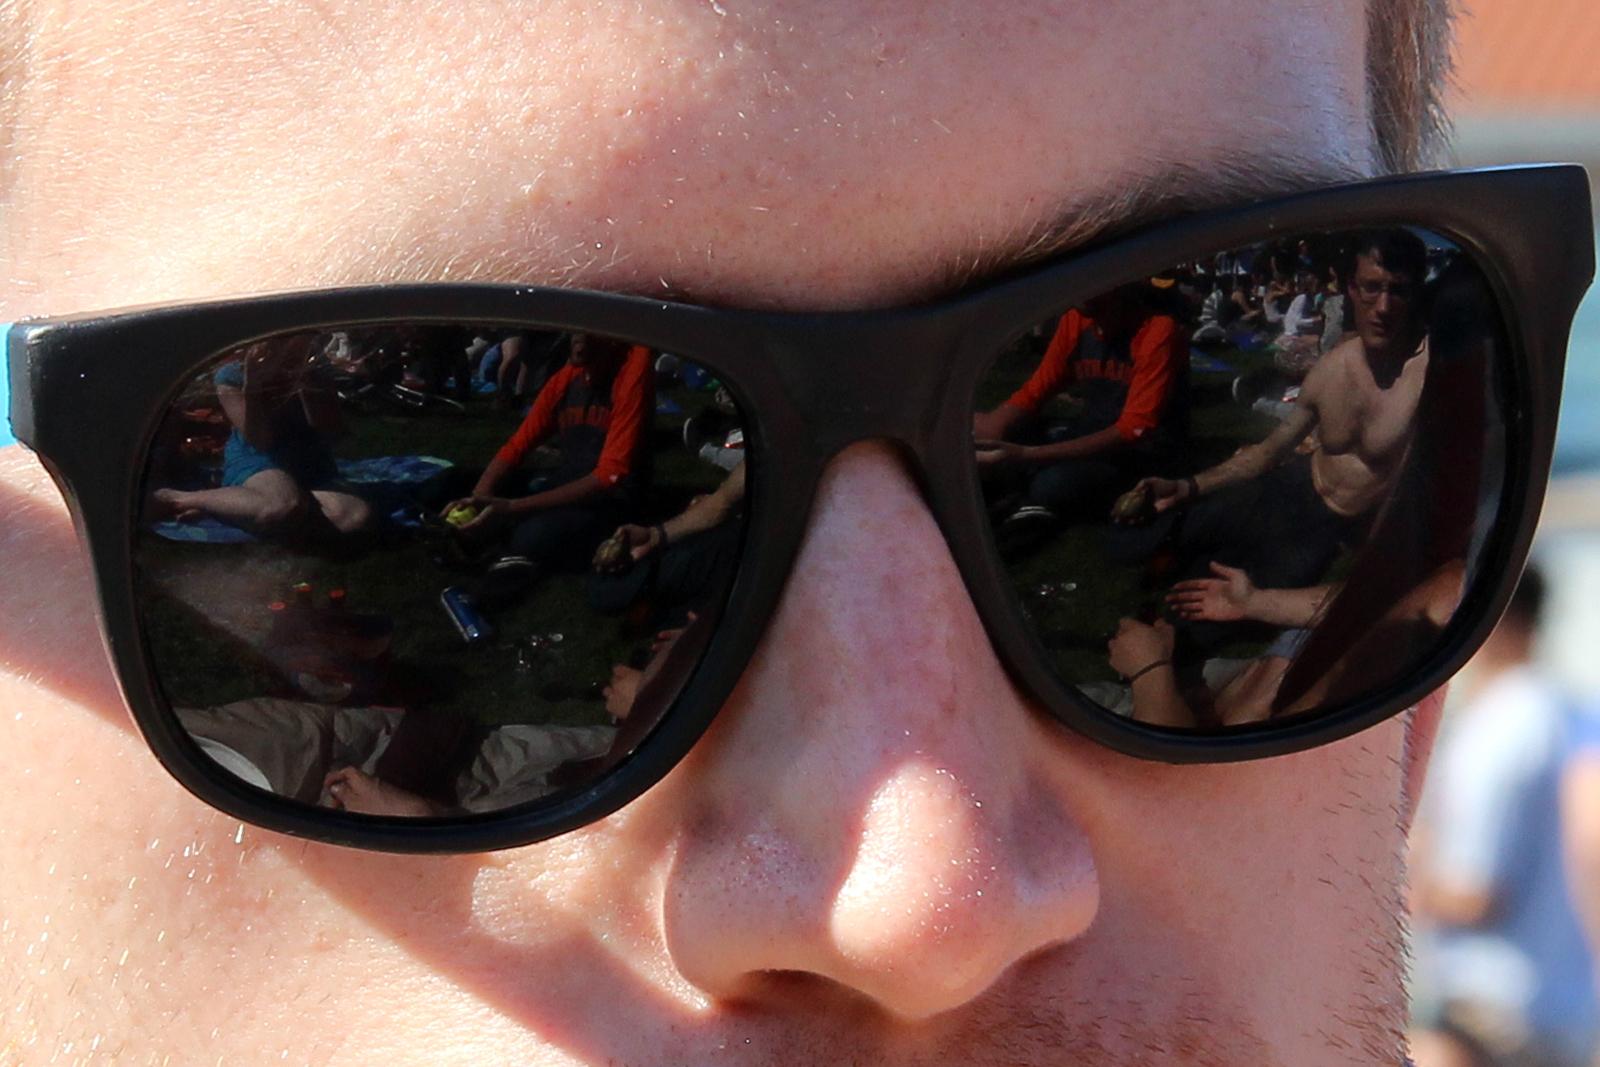 SNAP: Sunglasses